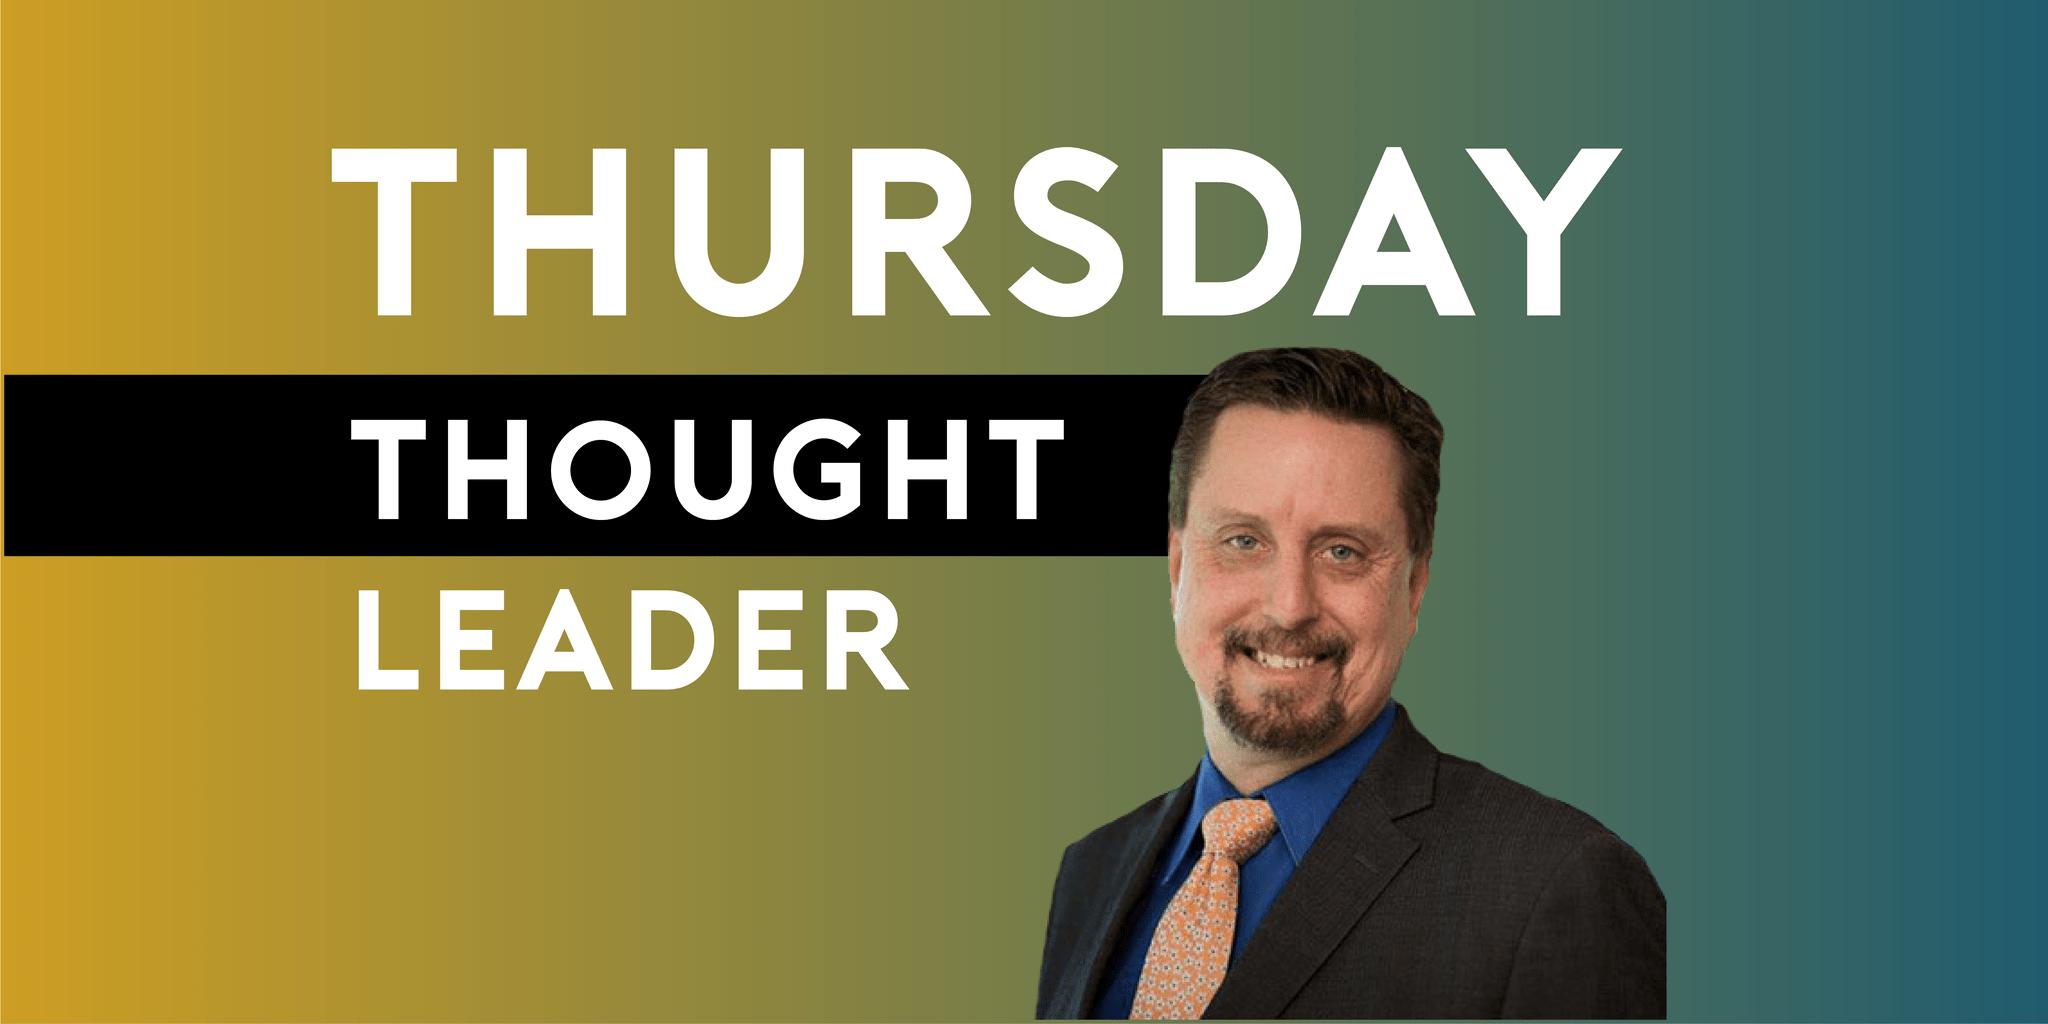 David J. Frankenberger of Ericksen Arbuthnot is LegalNet Inc's Thursday Thought Leader